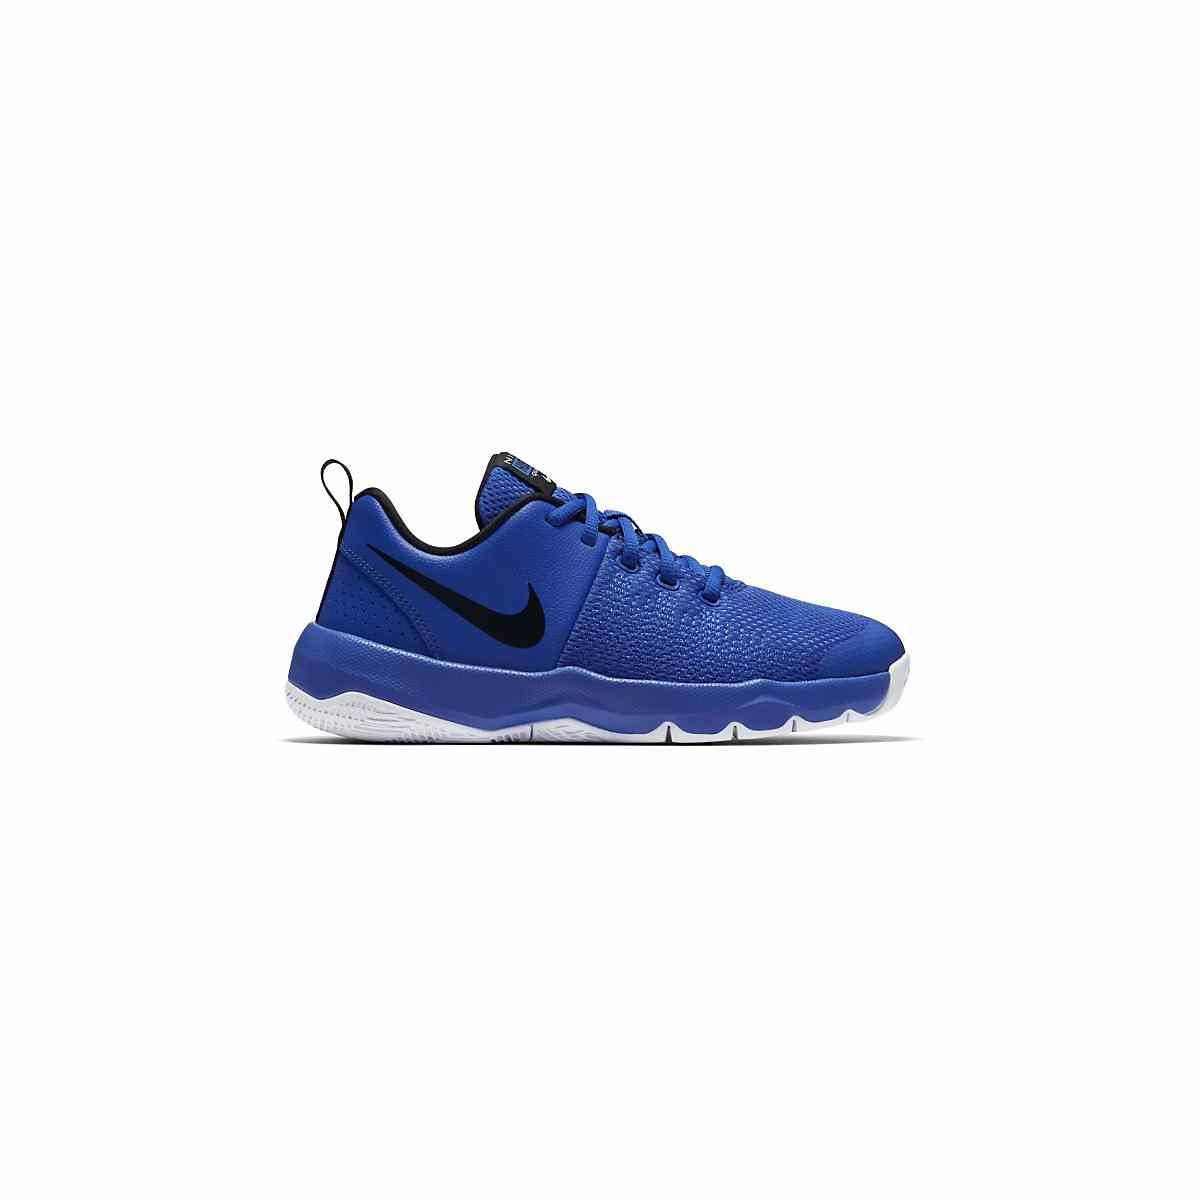 39bea4d7adaa5 Nike Boys Hustle Quick Shoes (2 Colors) + Ships Free $29.98 ...